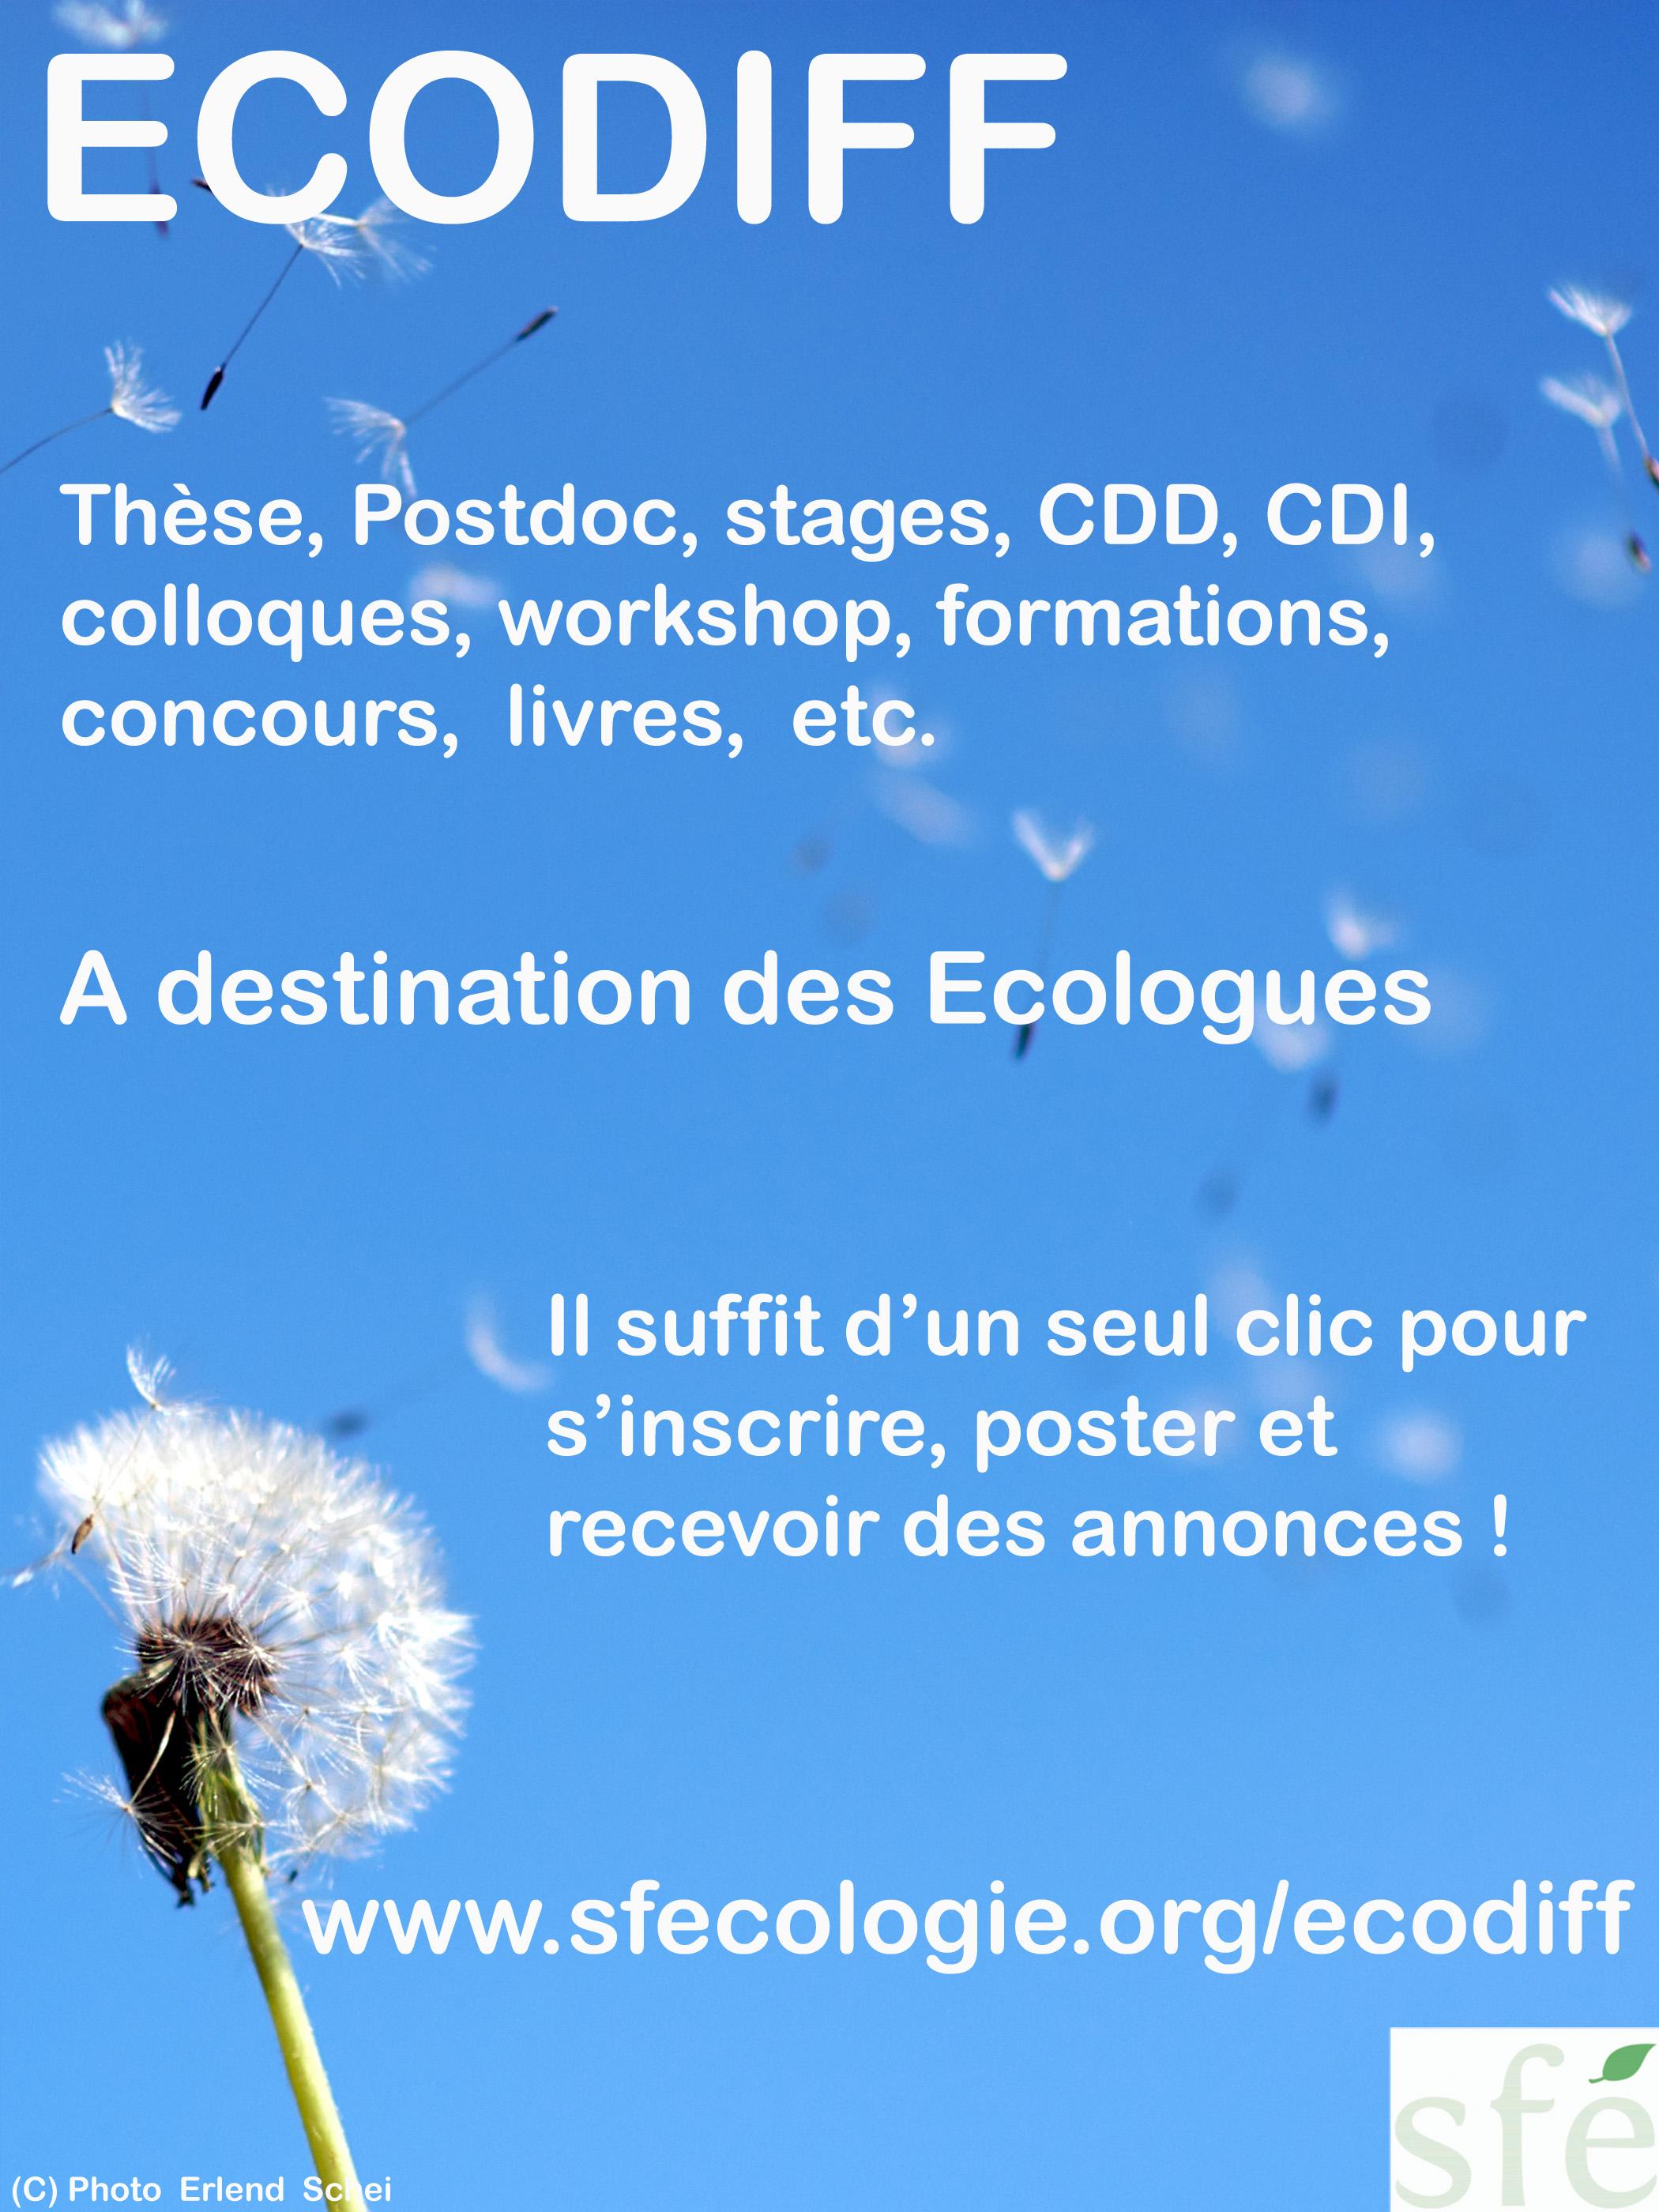 Affiche Ecodiff